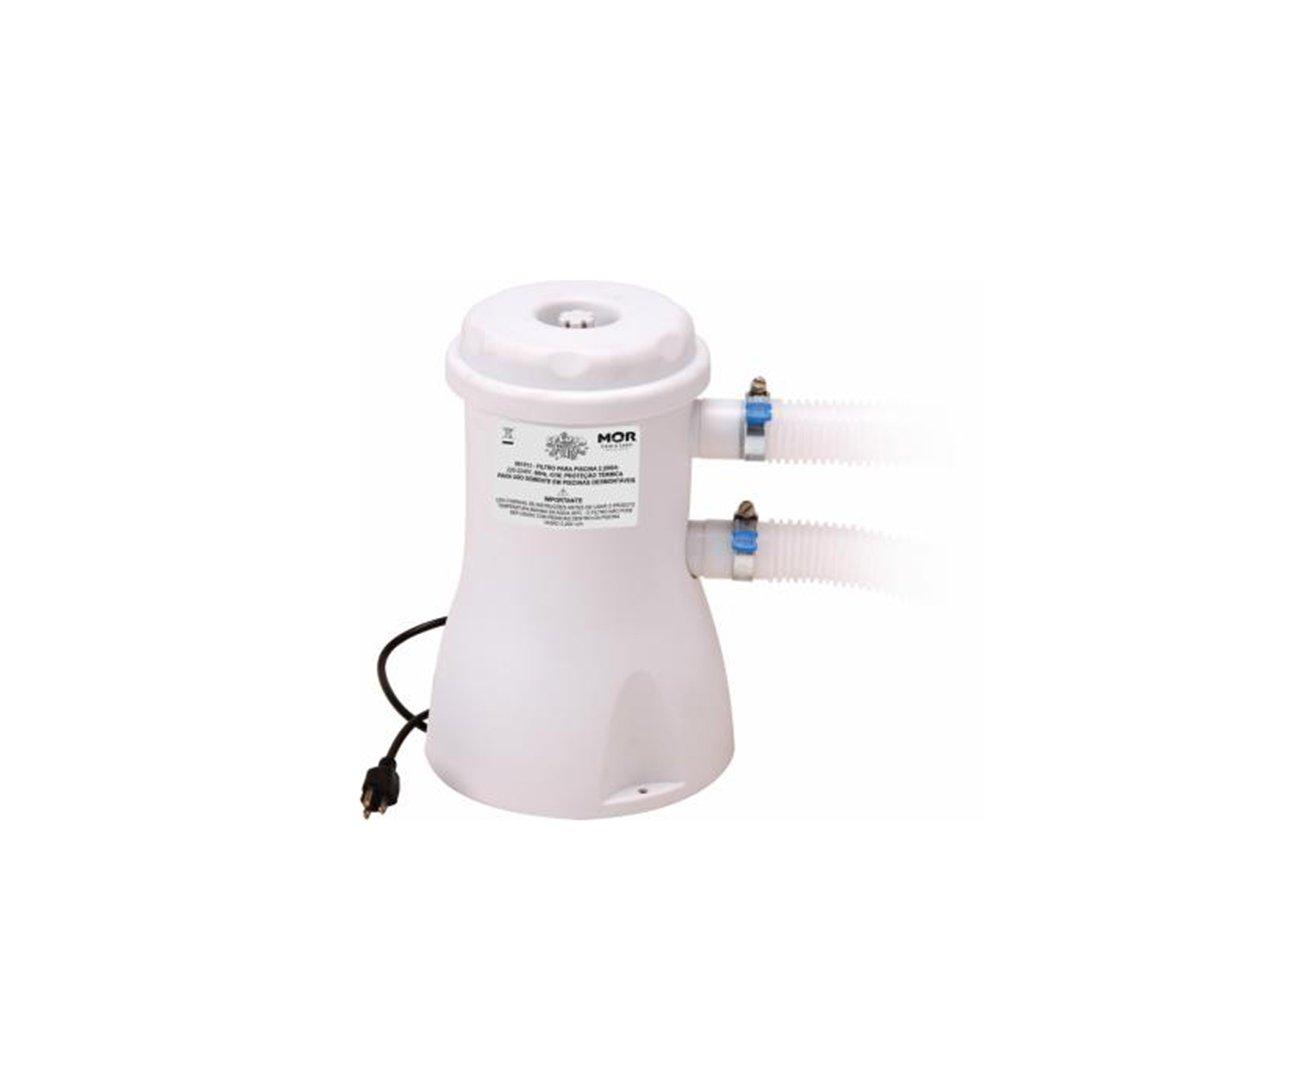 Filtro Para Piscina Vazão 2.200 Lts/hora 220v Mor